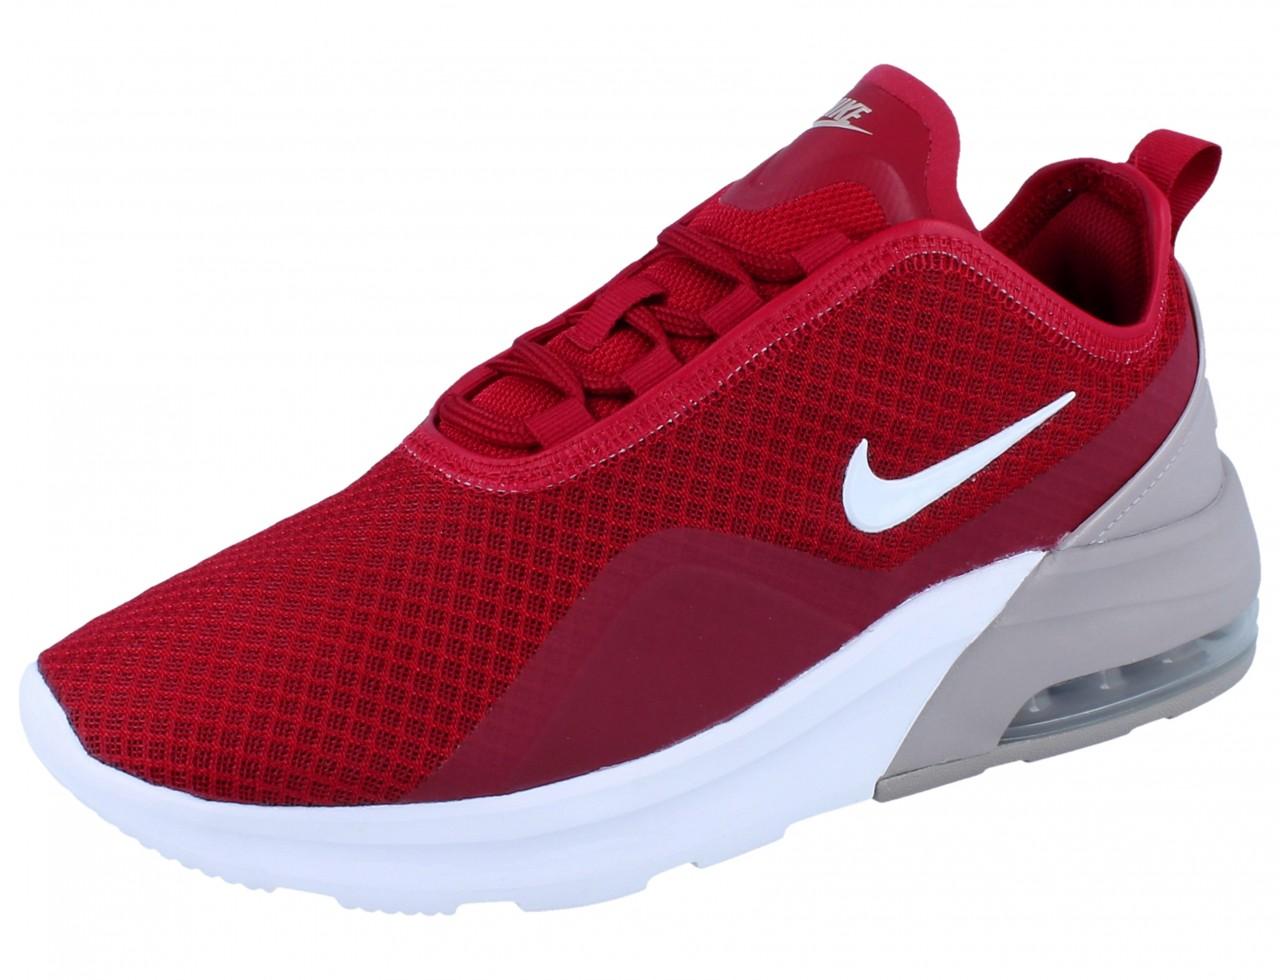 Nike Noble Redwhite Motion Max 2 Wmns Pumice Air UqLVpzGSM